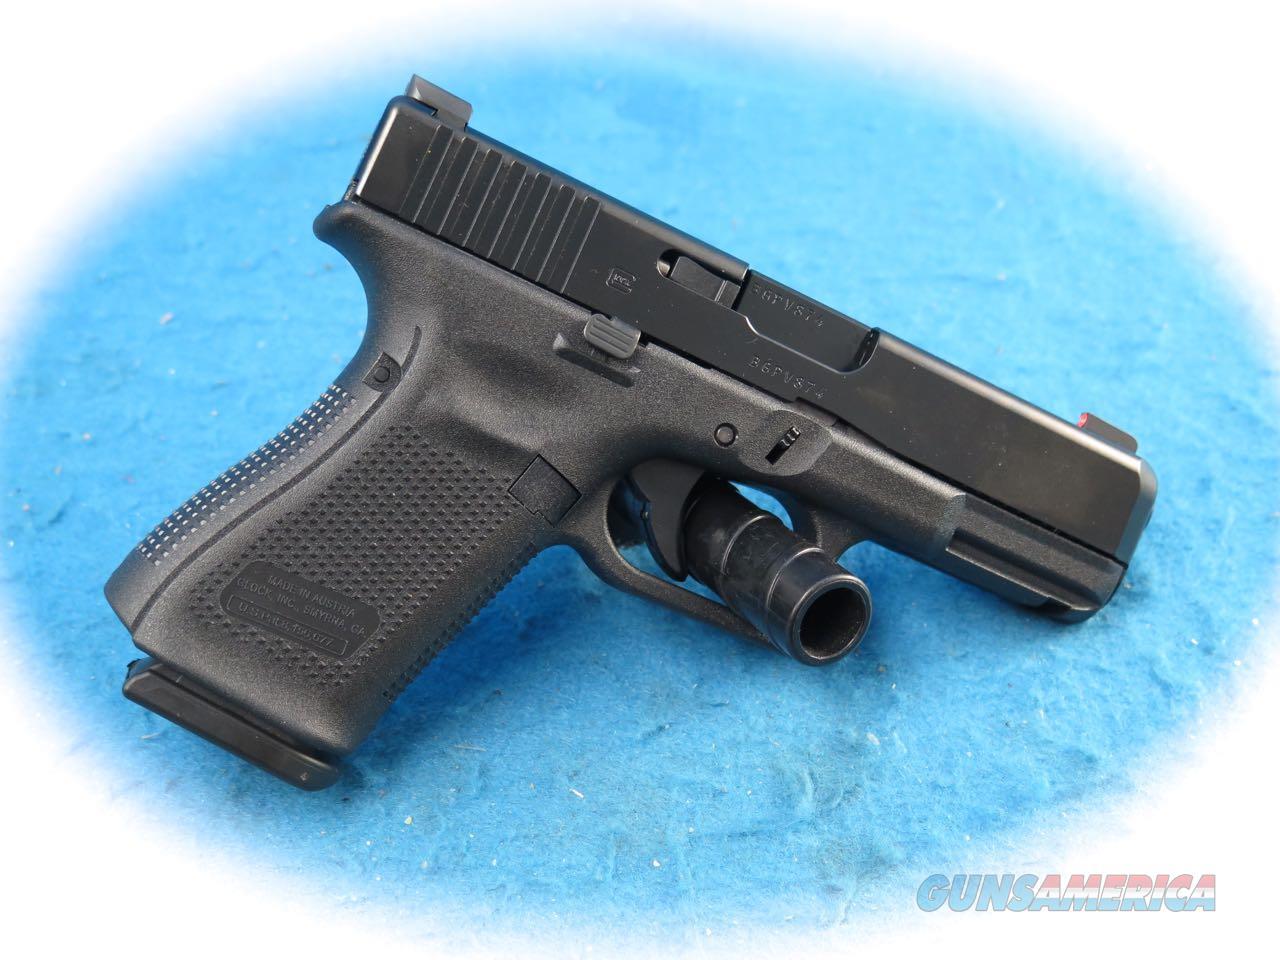 Glock Model 19 Gen 5 9mm Pistol W/Ameriglo Night Sights **New**  Guns > Pistols > Glock Pistols > 19